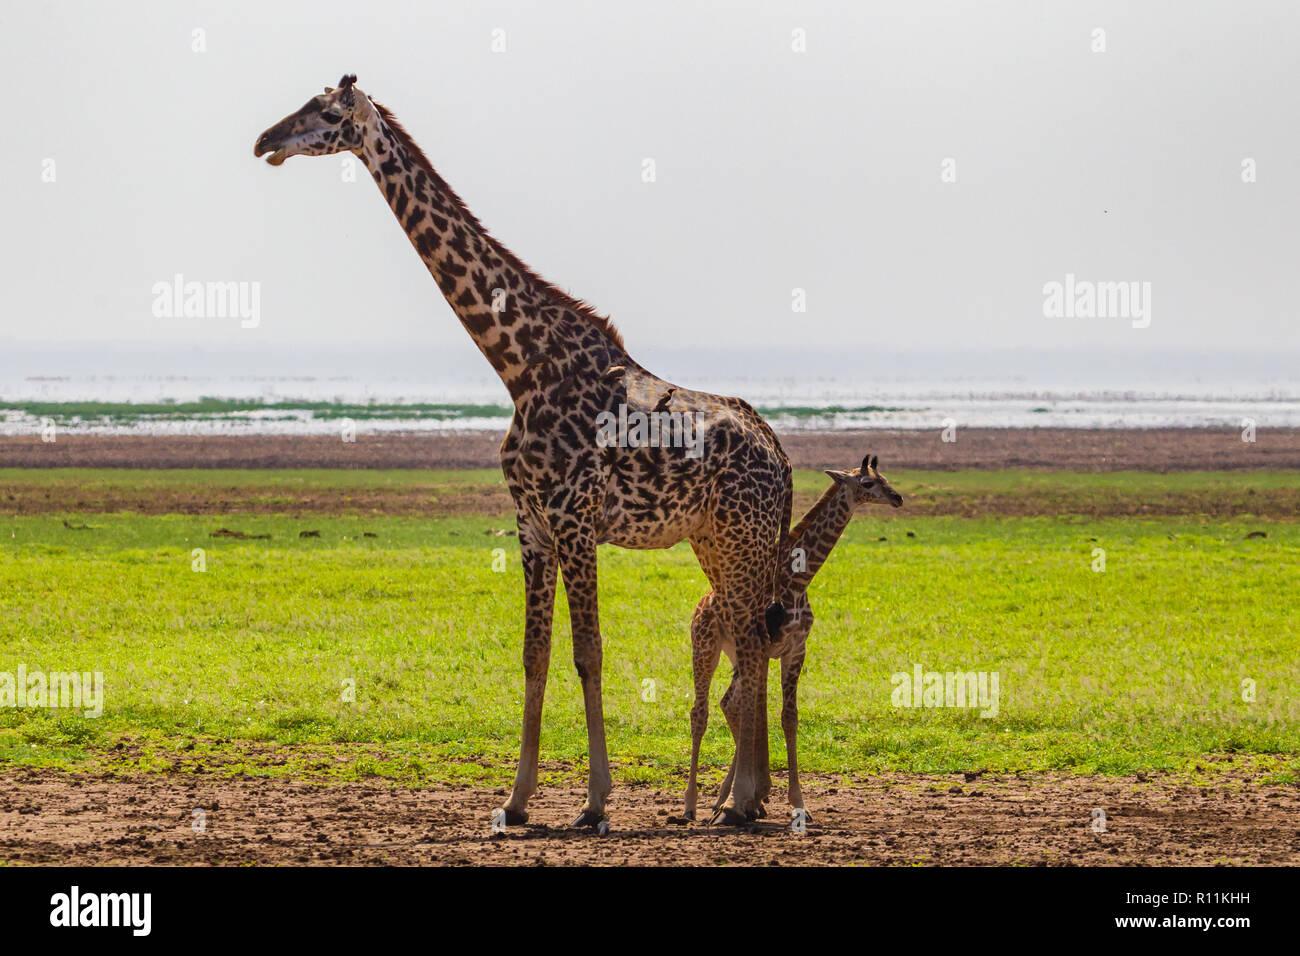 Giraffe. Lake Manyara National Reserve. Tanzania. - Stock Image